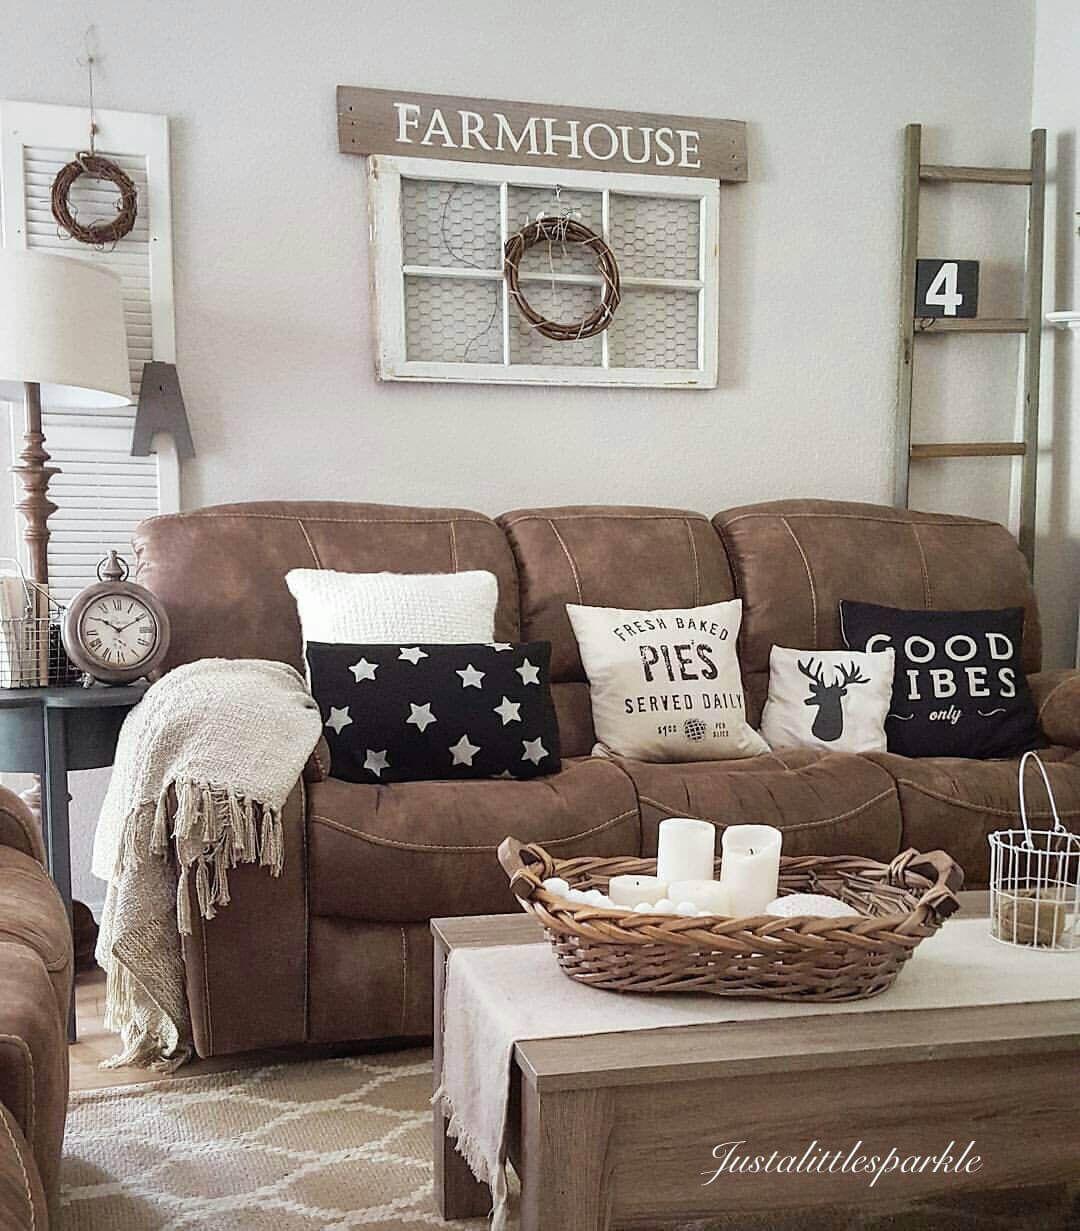 50 Rustic Farmhouse Living Room Design And Decor Ideas For Your Home Farm House Living Room Farmhouse Style Living Room Farmhouse Decor Living Room